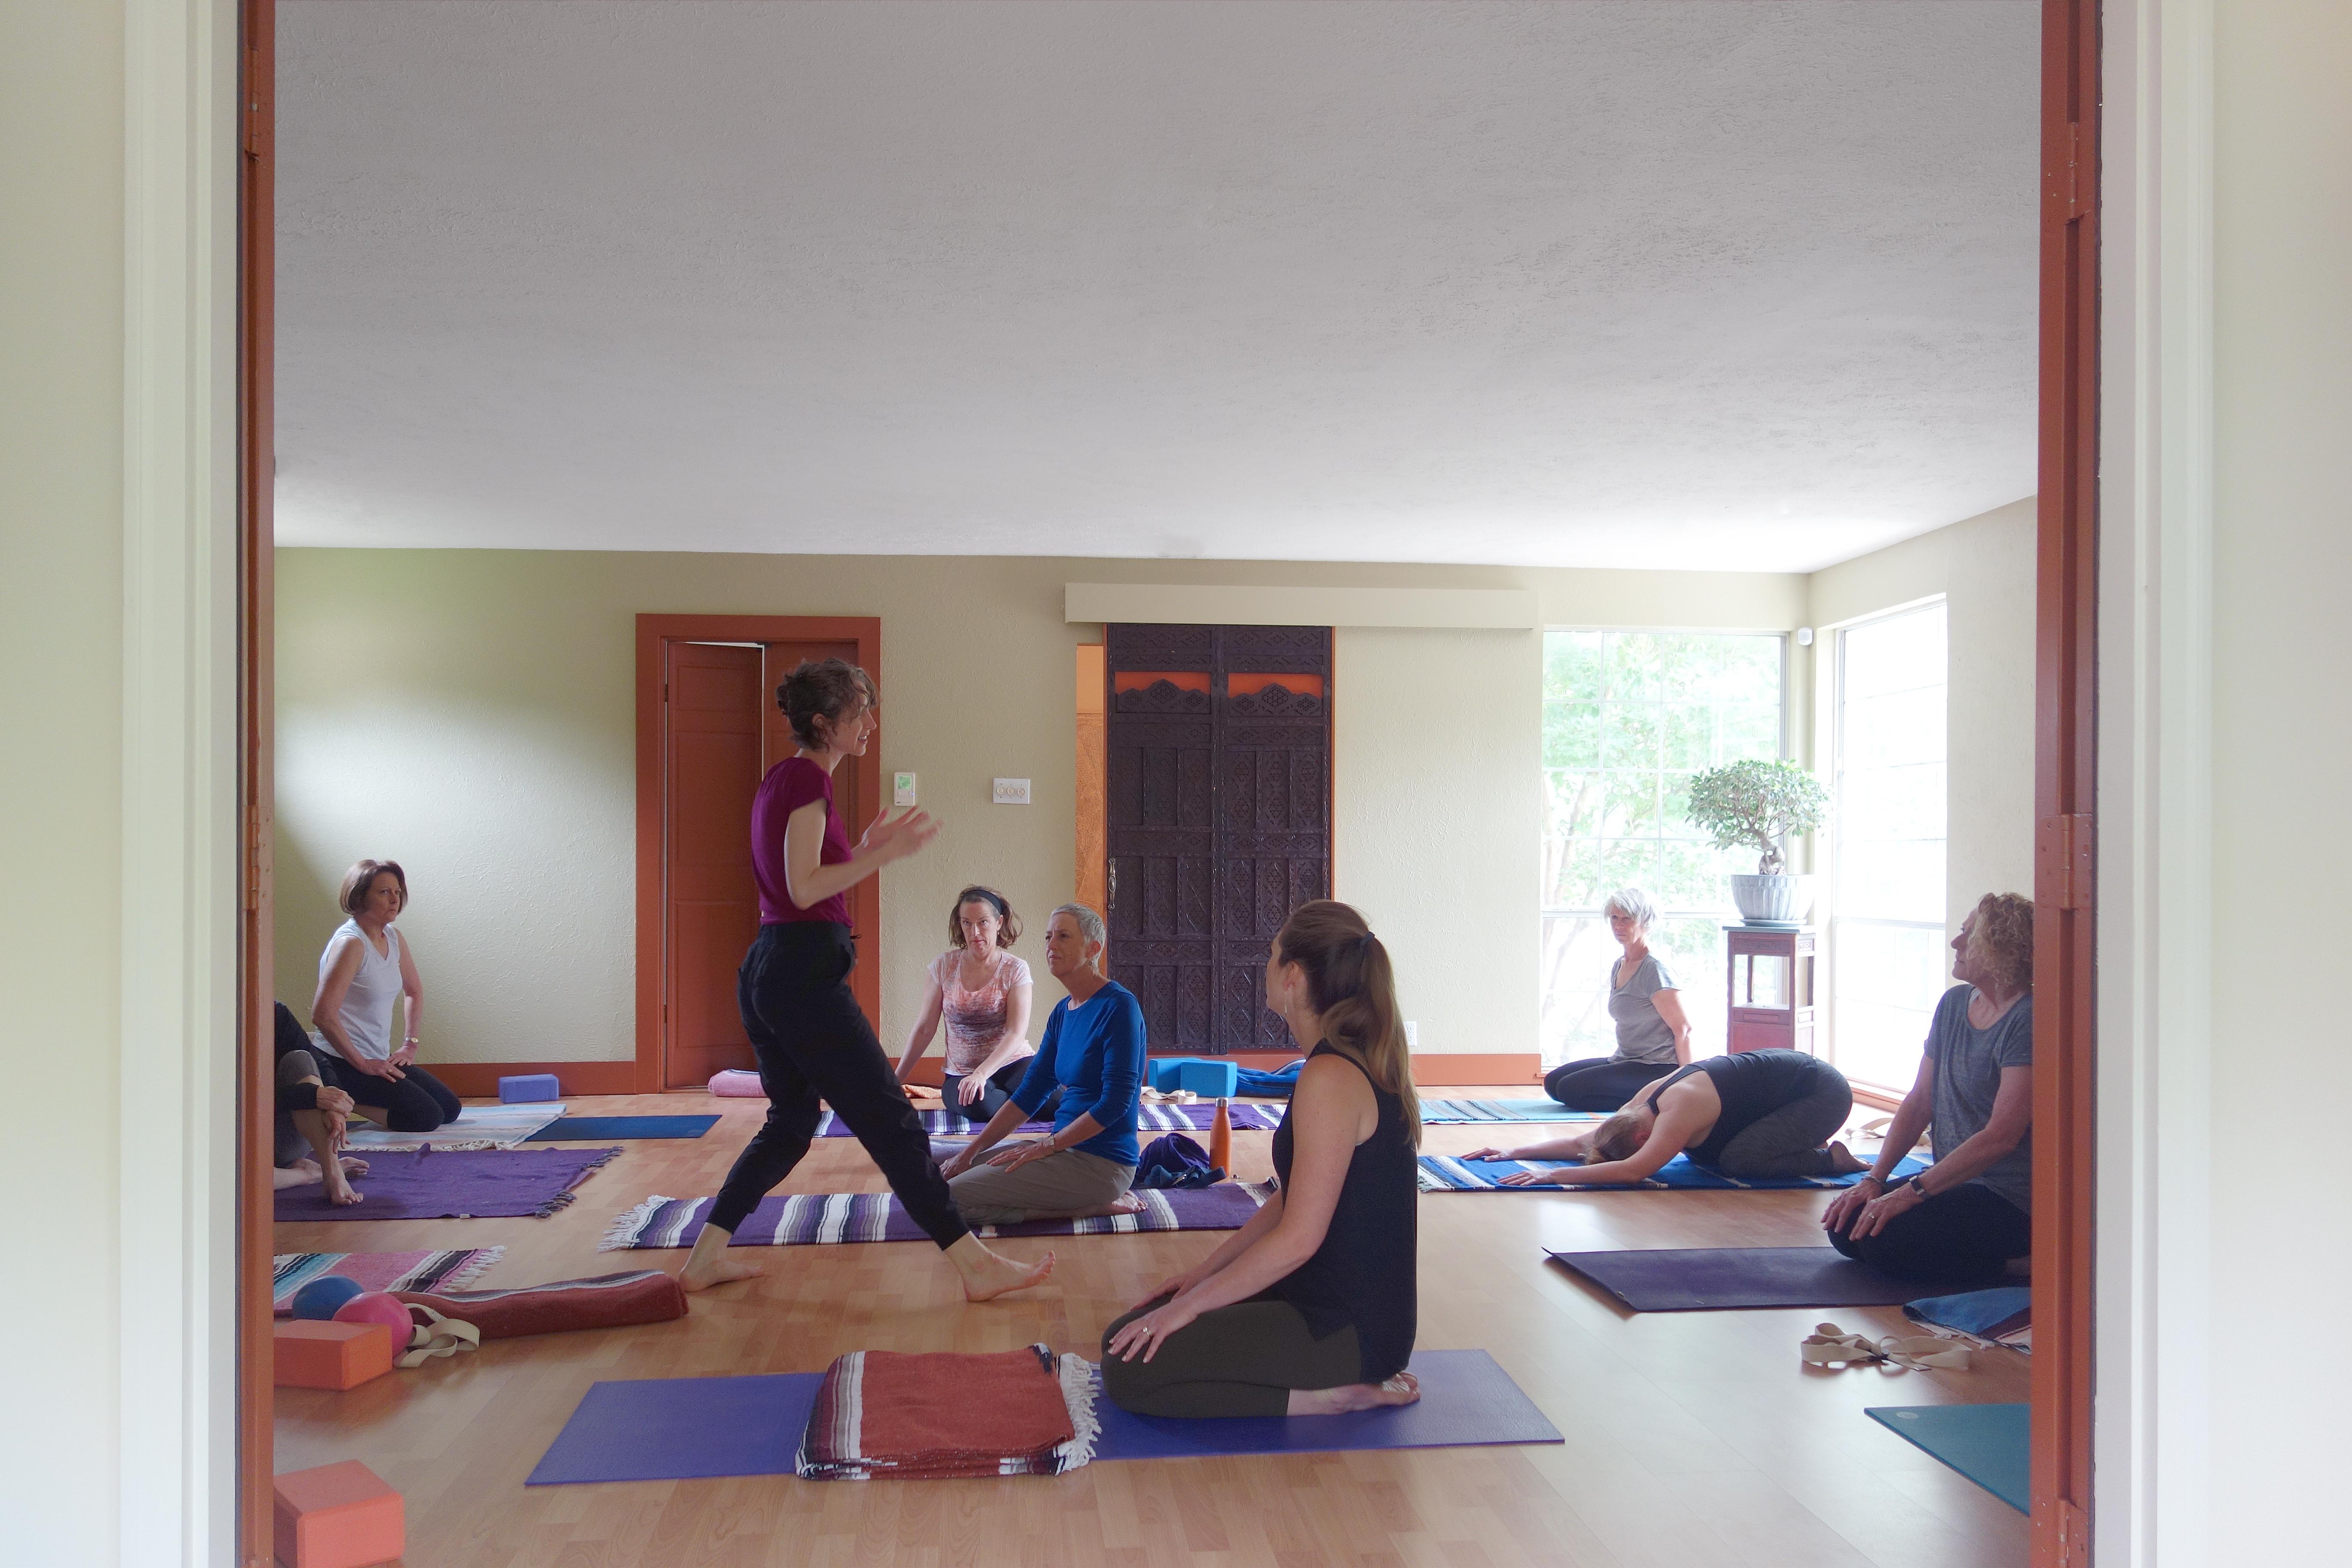 somatic yoga class dallas Jessica O'Keefe demonstrating